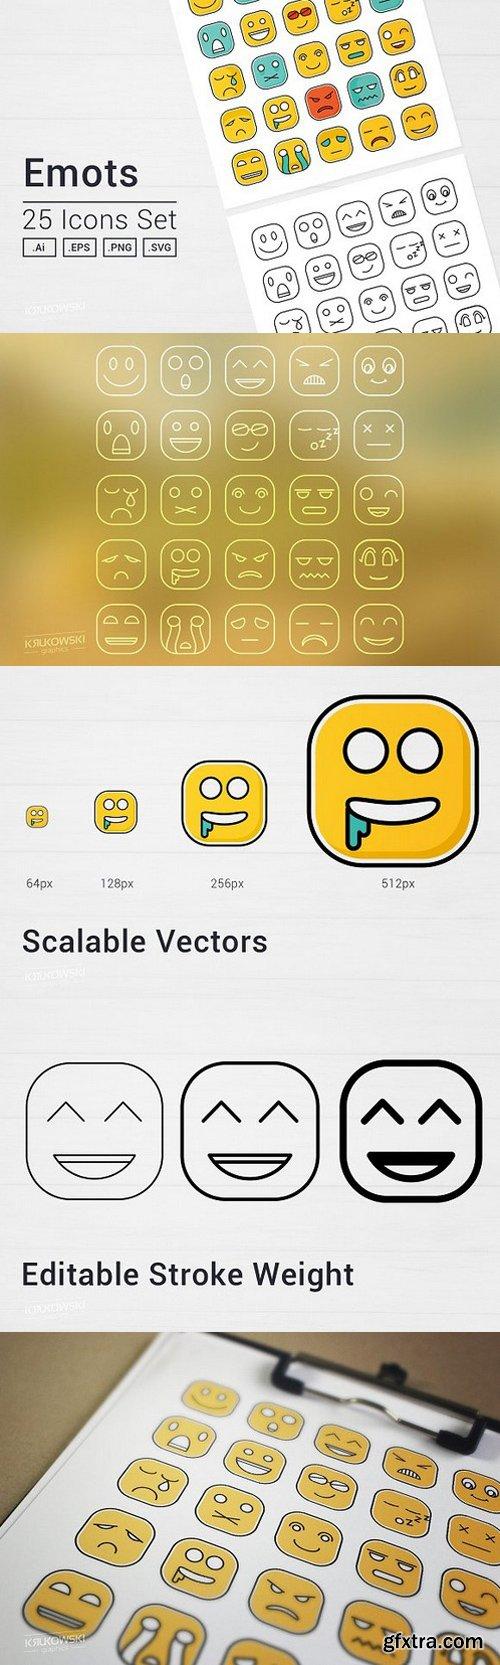 Square Emot Icons Set